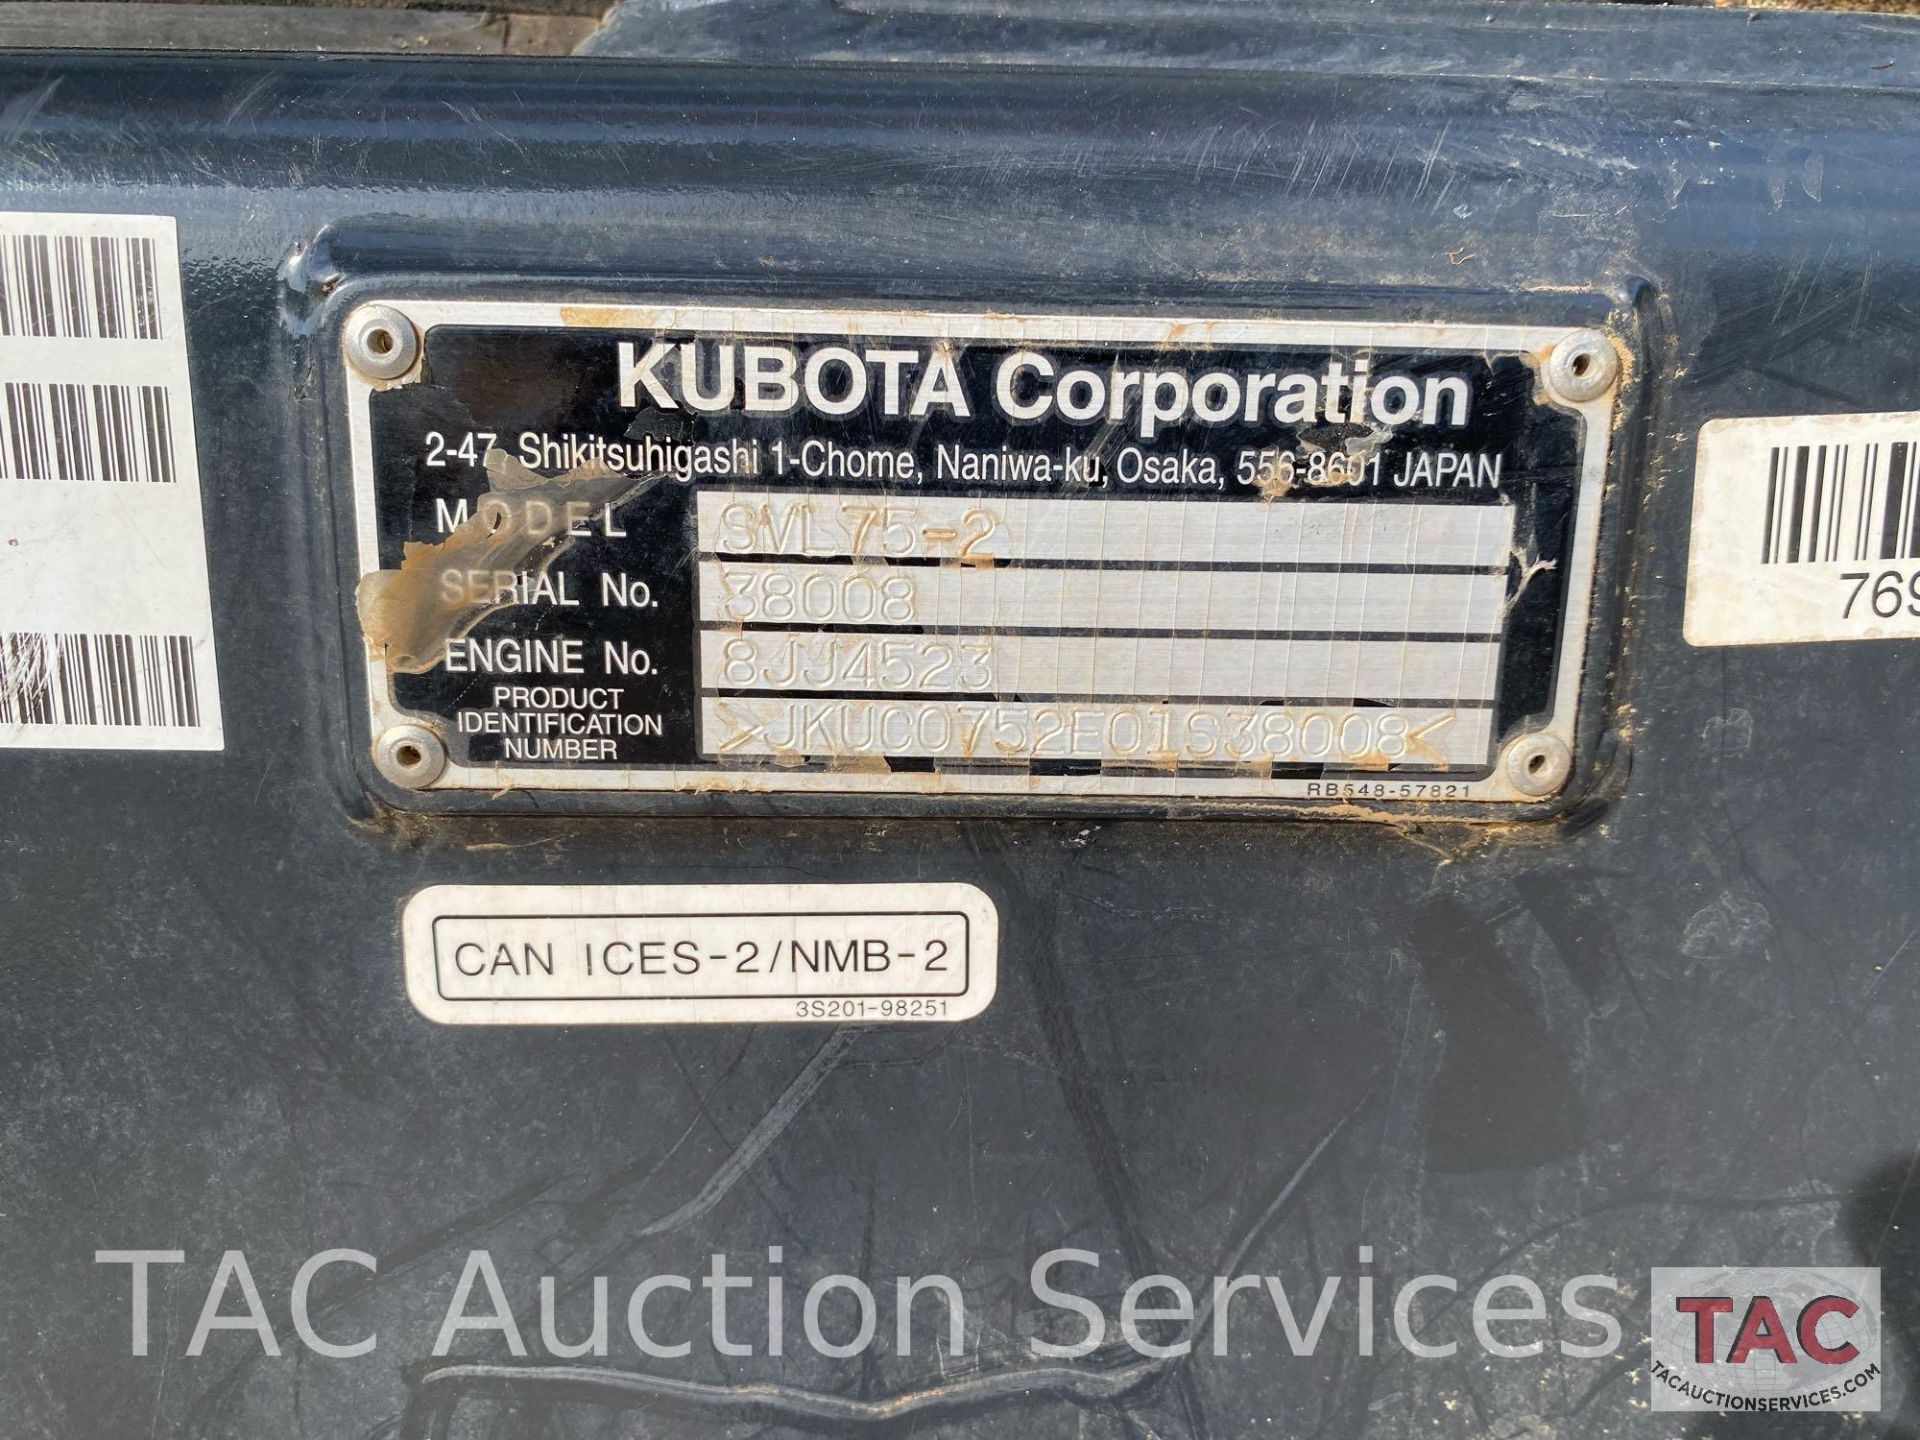 Kubota SVL 75-2 Skidsteer - Image 38 of 38